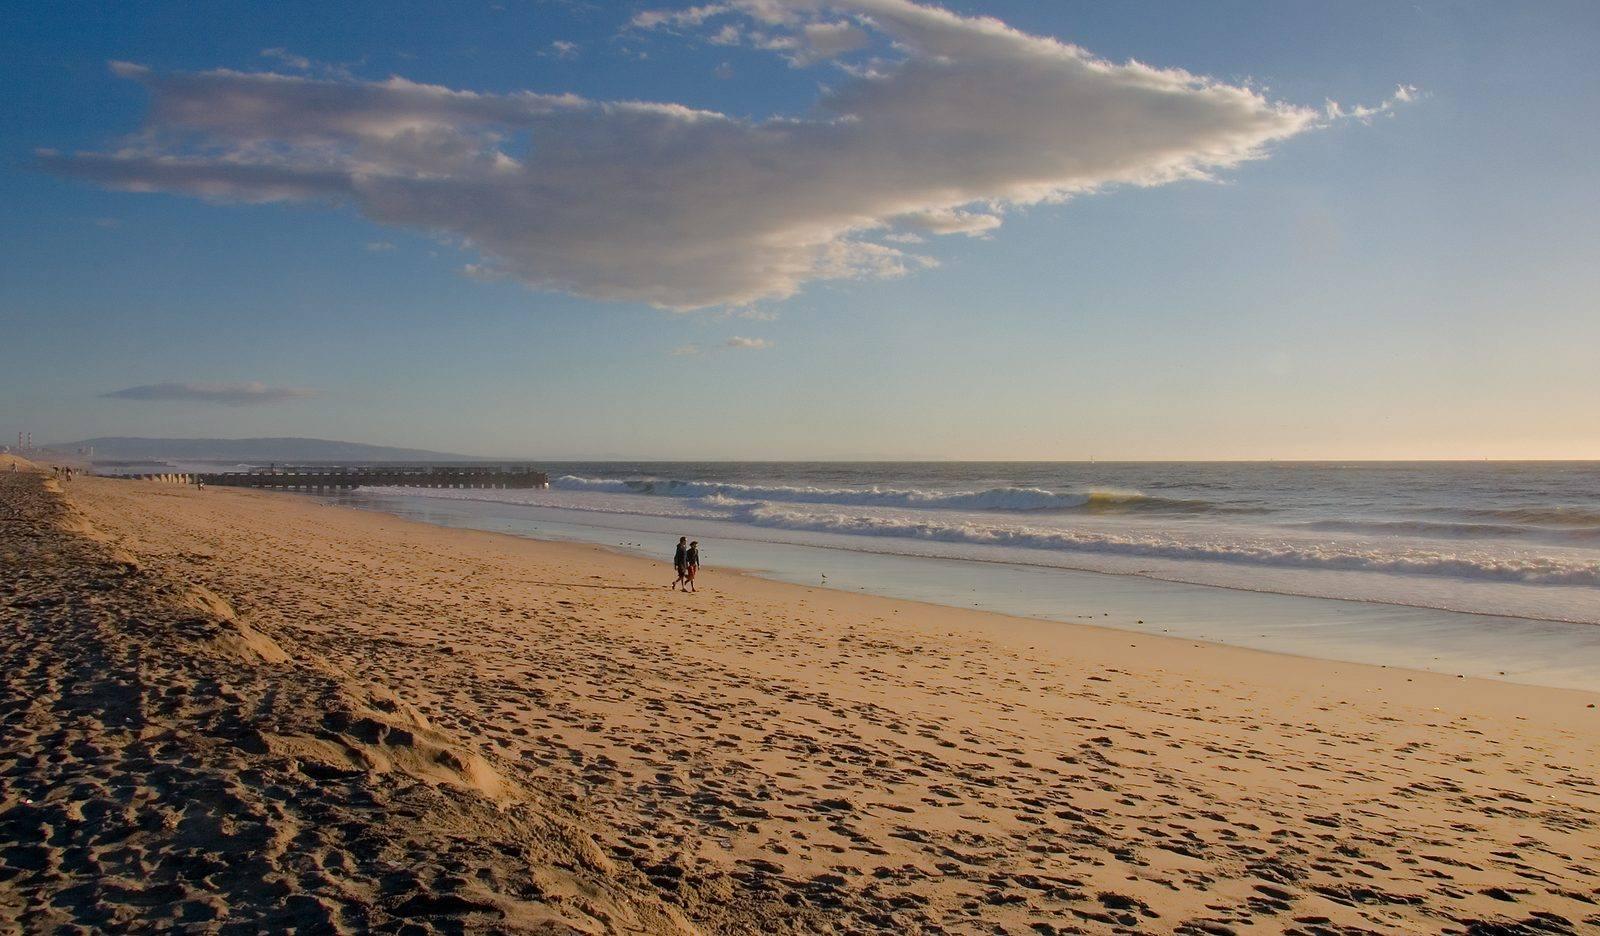 Playa Estatal Dockweiler